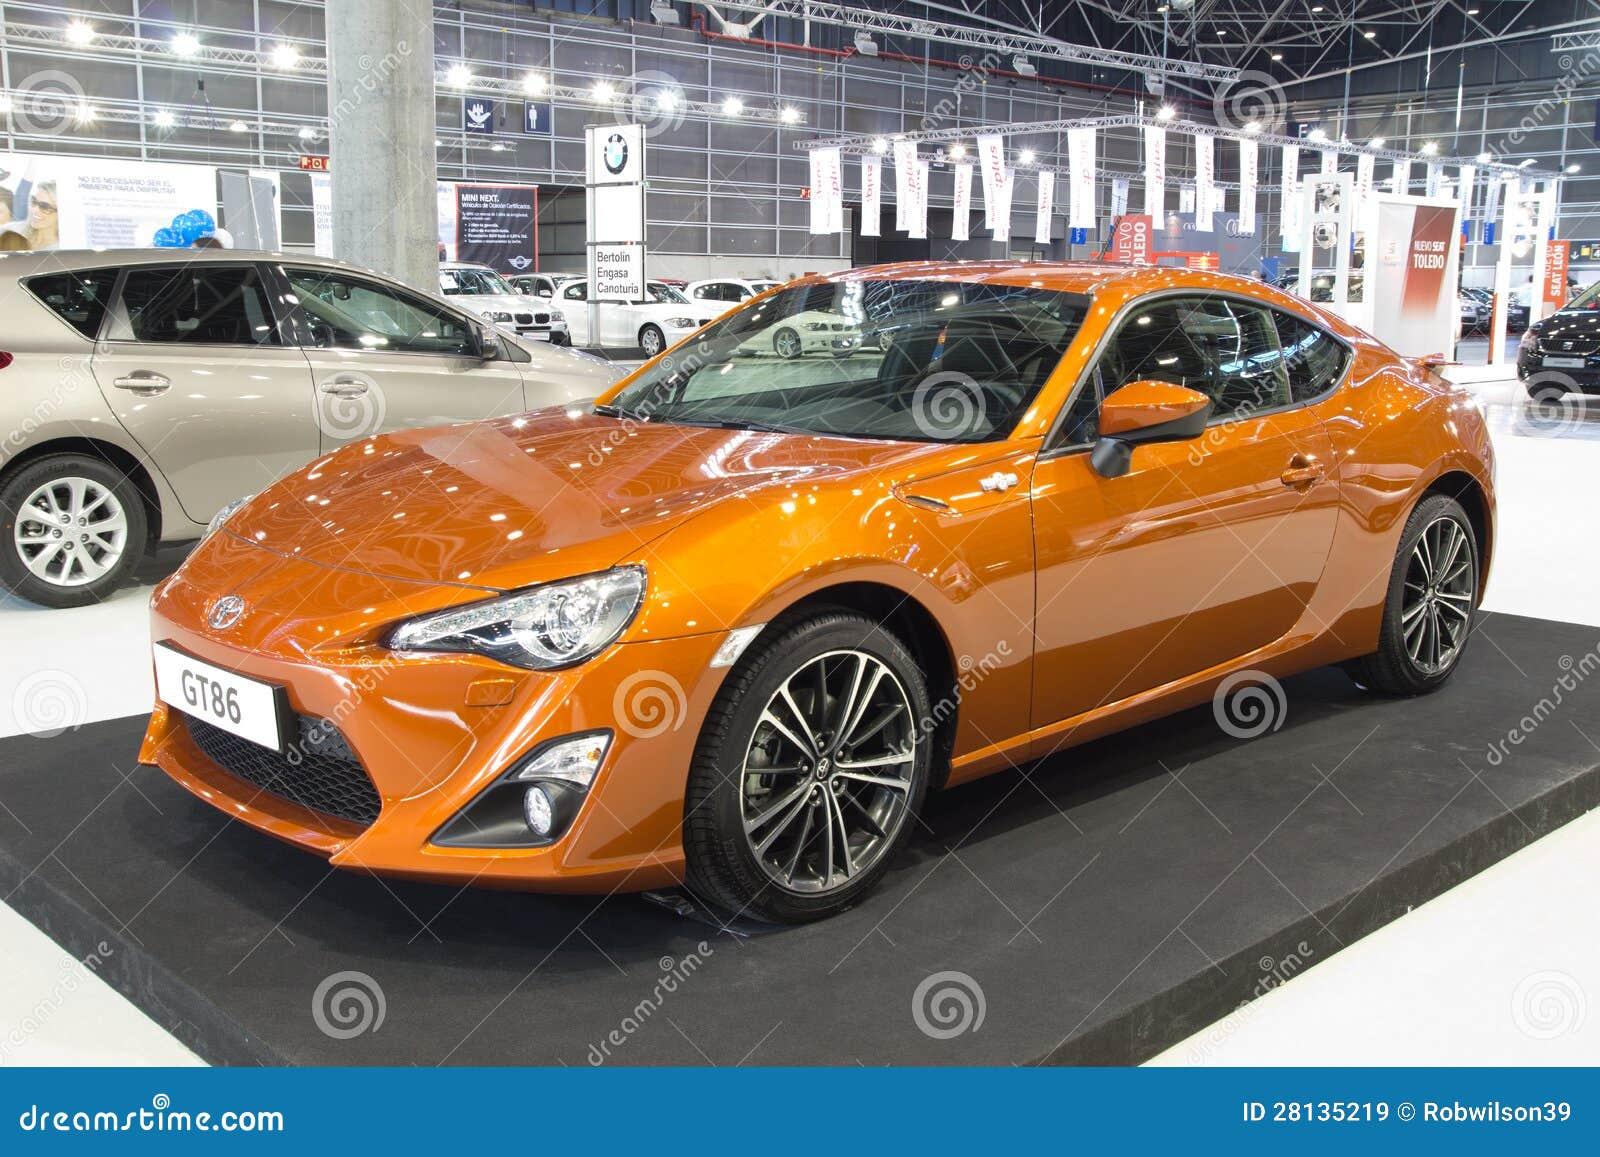 Valencia Car Show Editorial Stock Image Image Of Auto 28135219